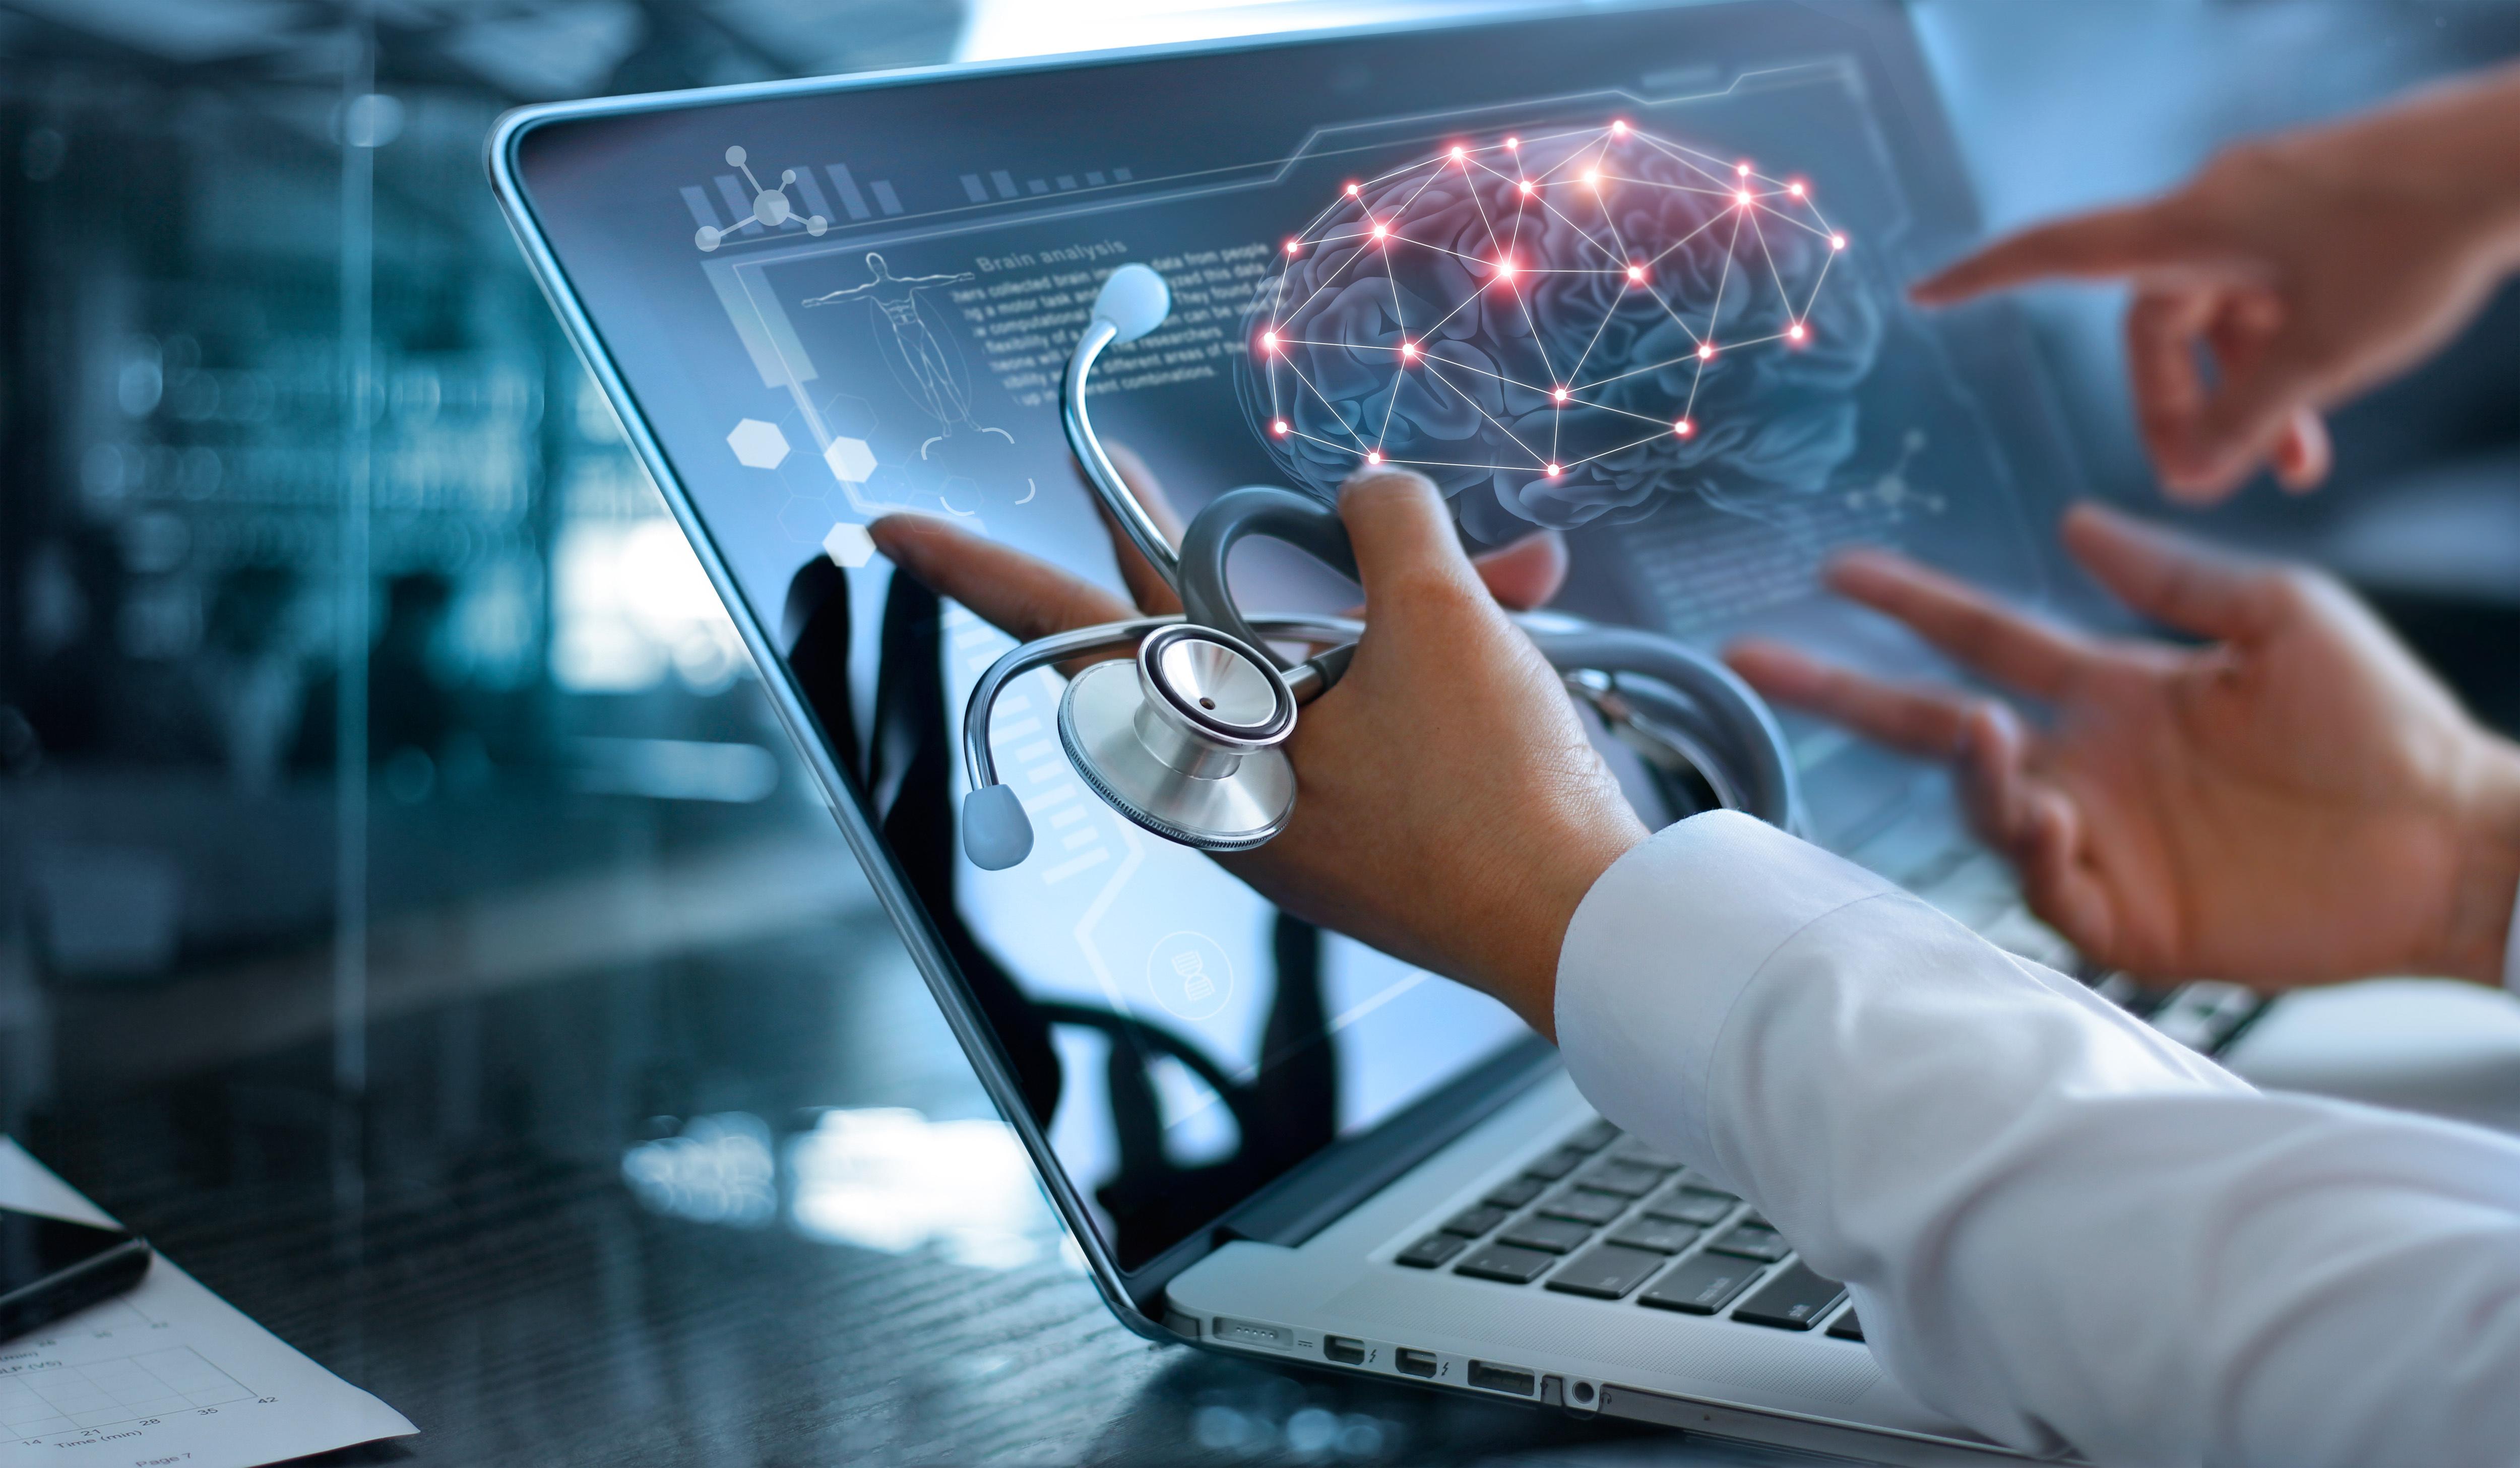 Introducing Our FDA Designated Breakthrough: BrainSee Enterprise Software for Prognostic Measurement after aMCI Diagnosis